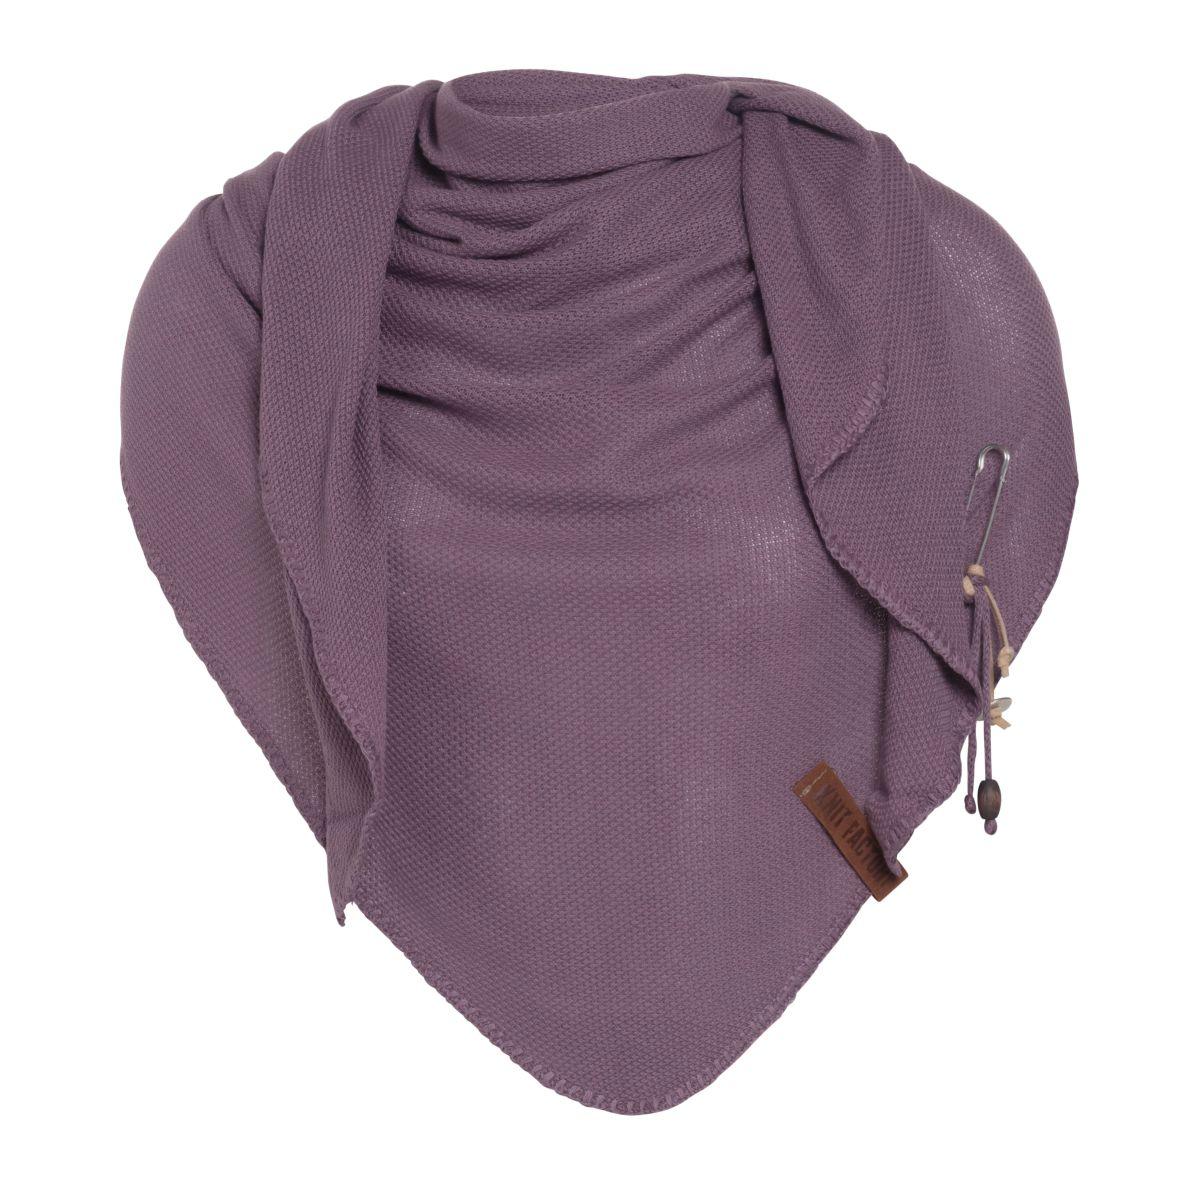 knit factory kf130060027 lola omslagdoek lila 1